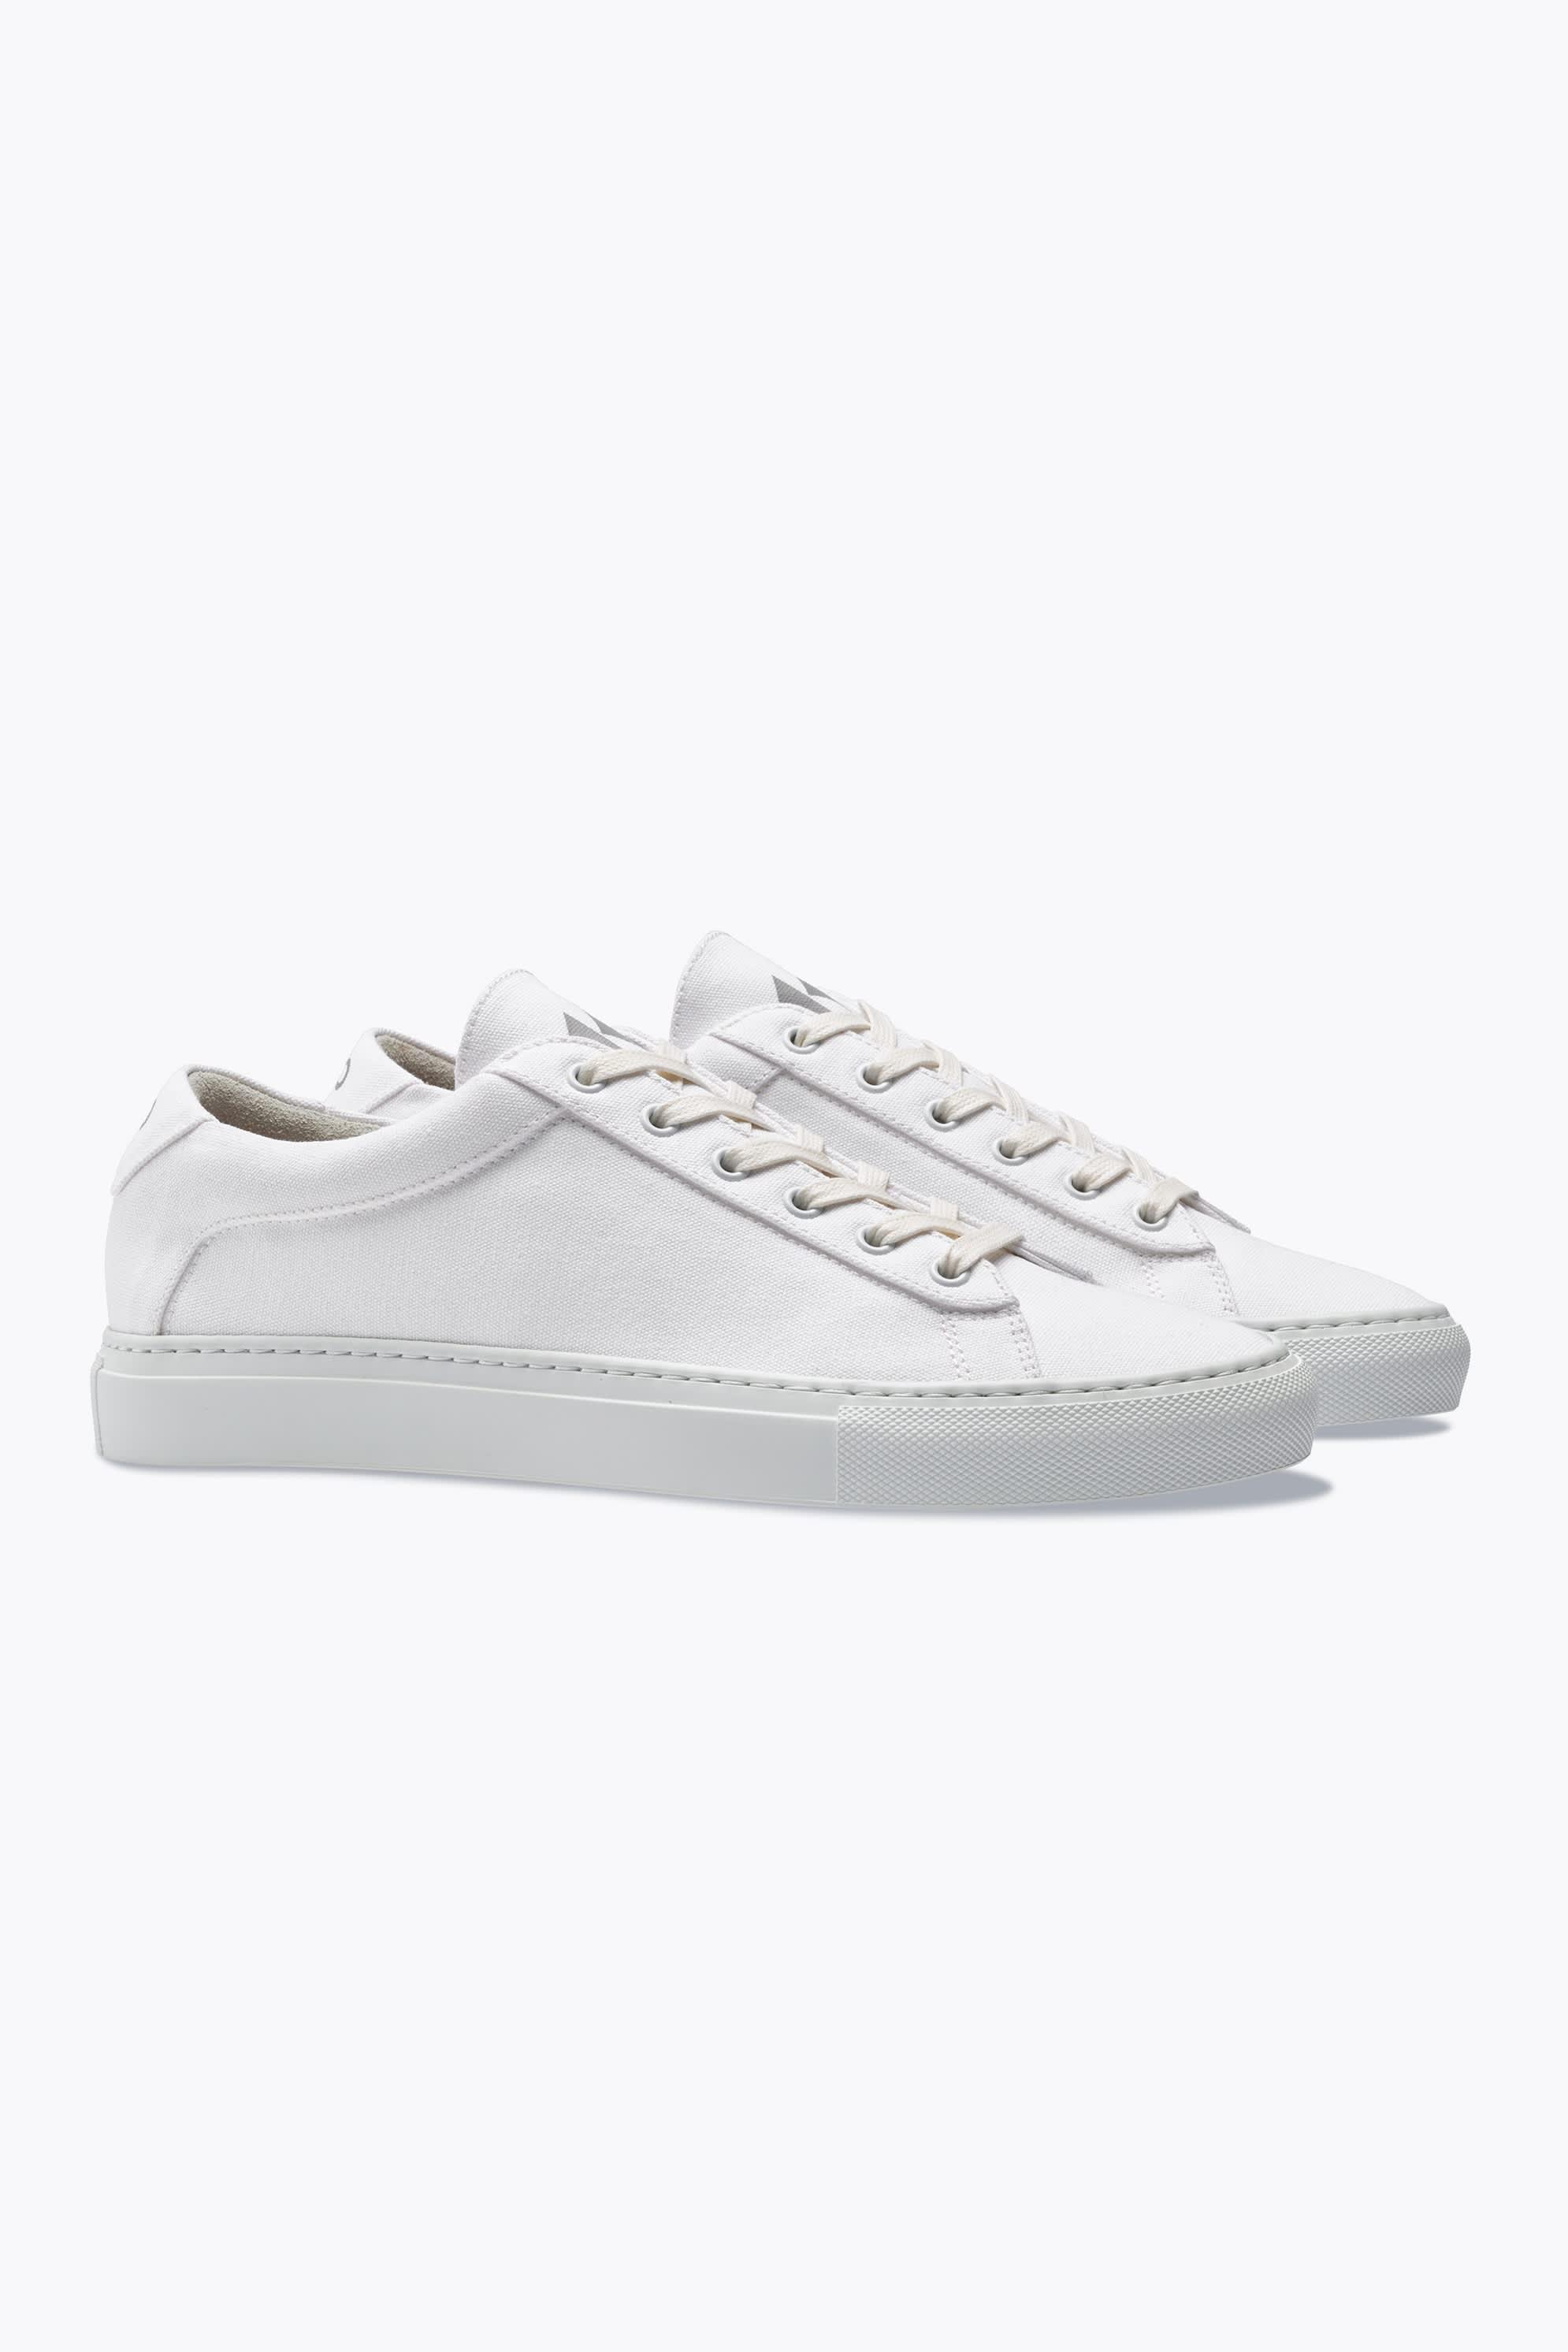 The Koio Capri Bianco Low-Top Sneakers